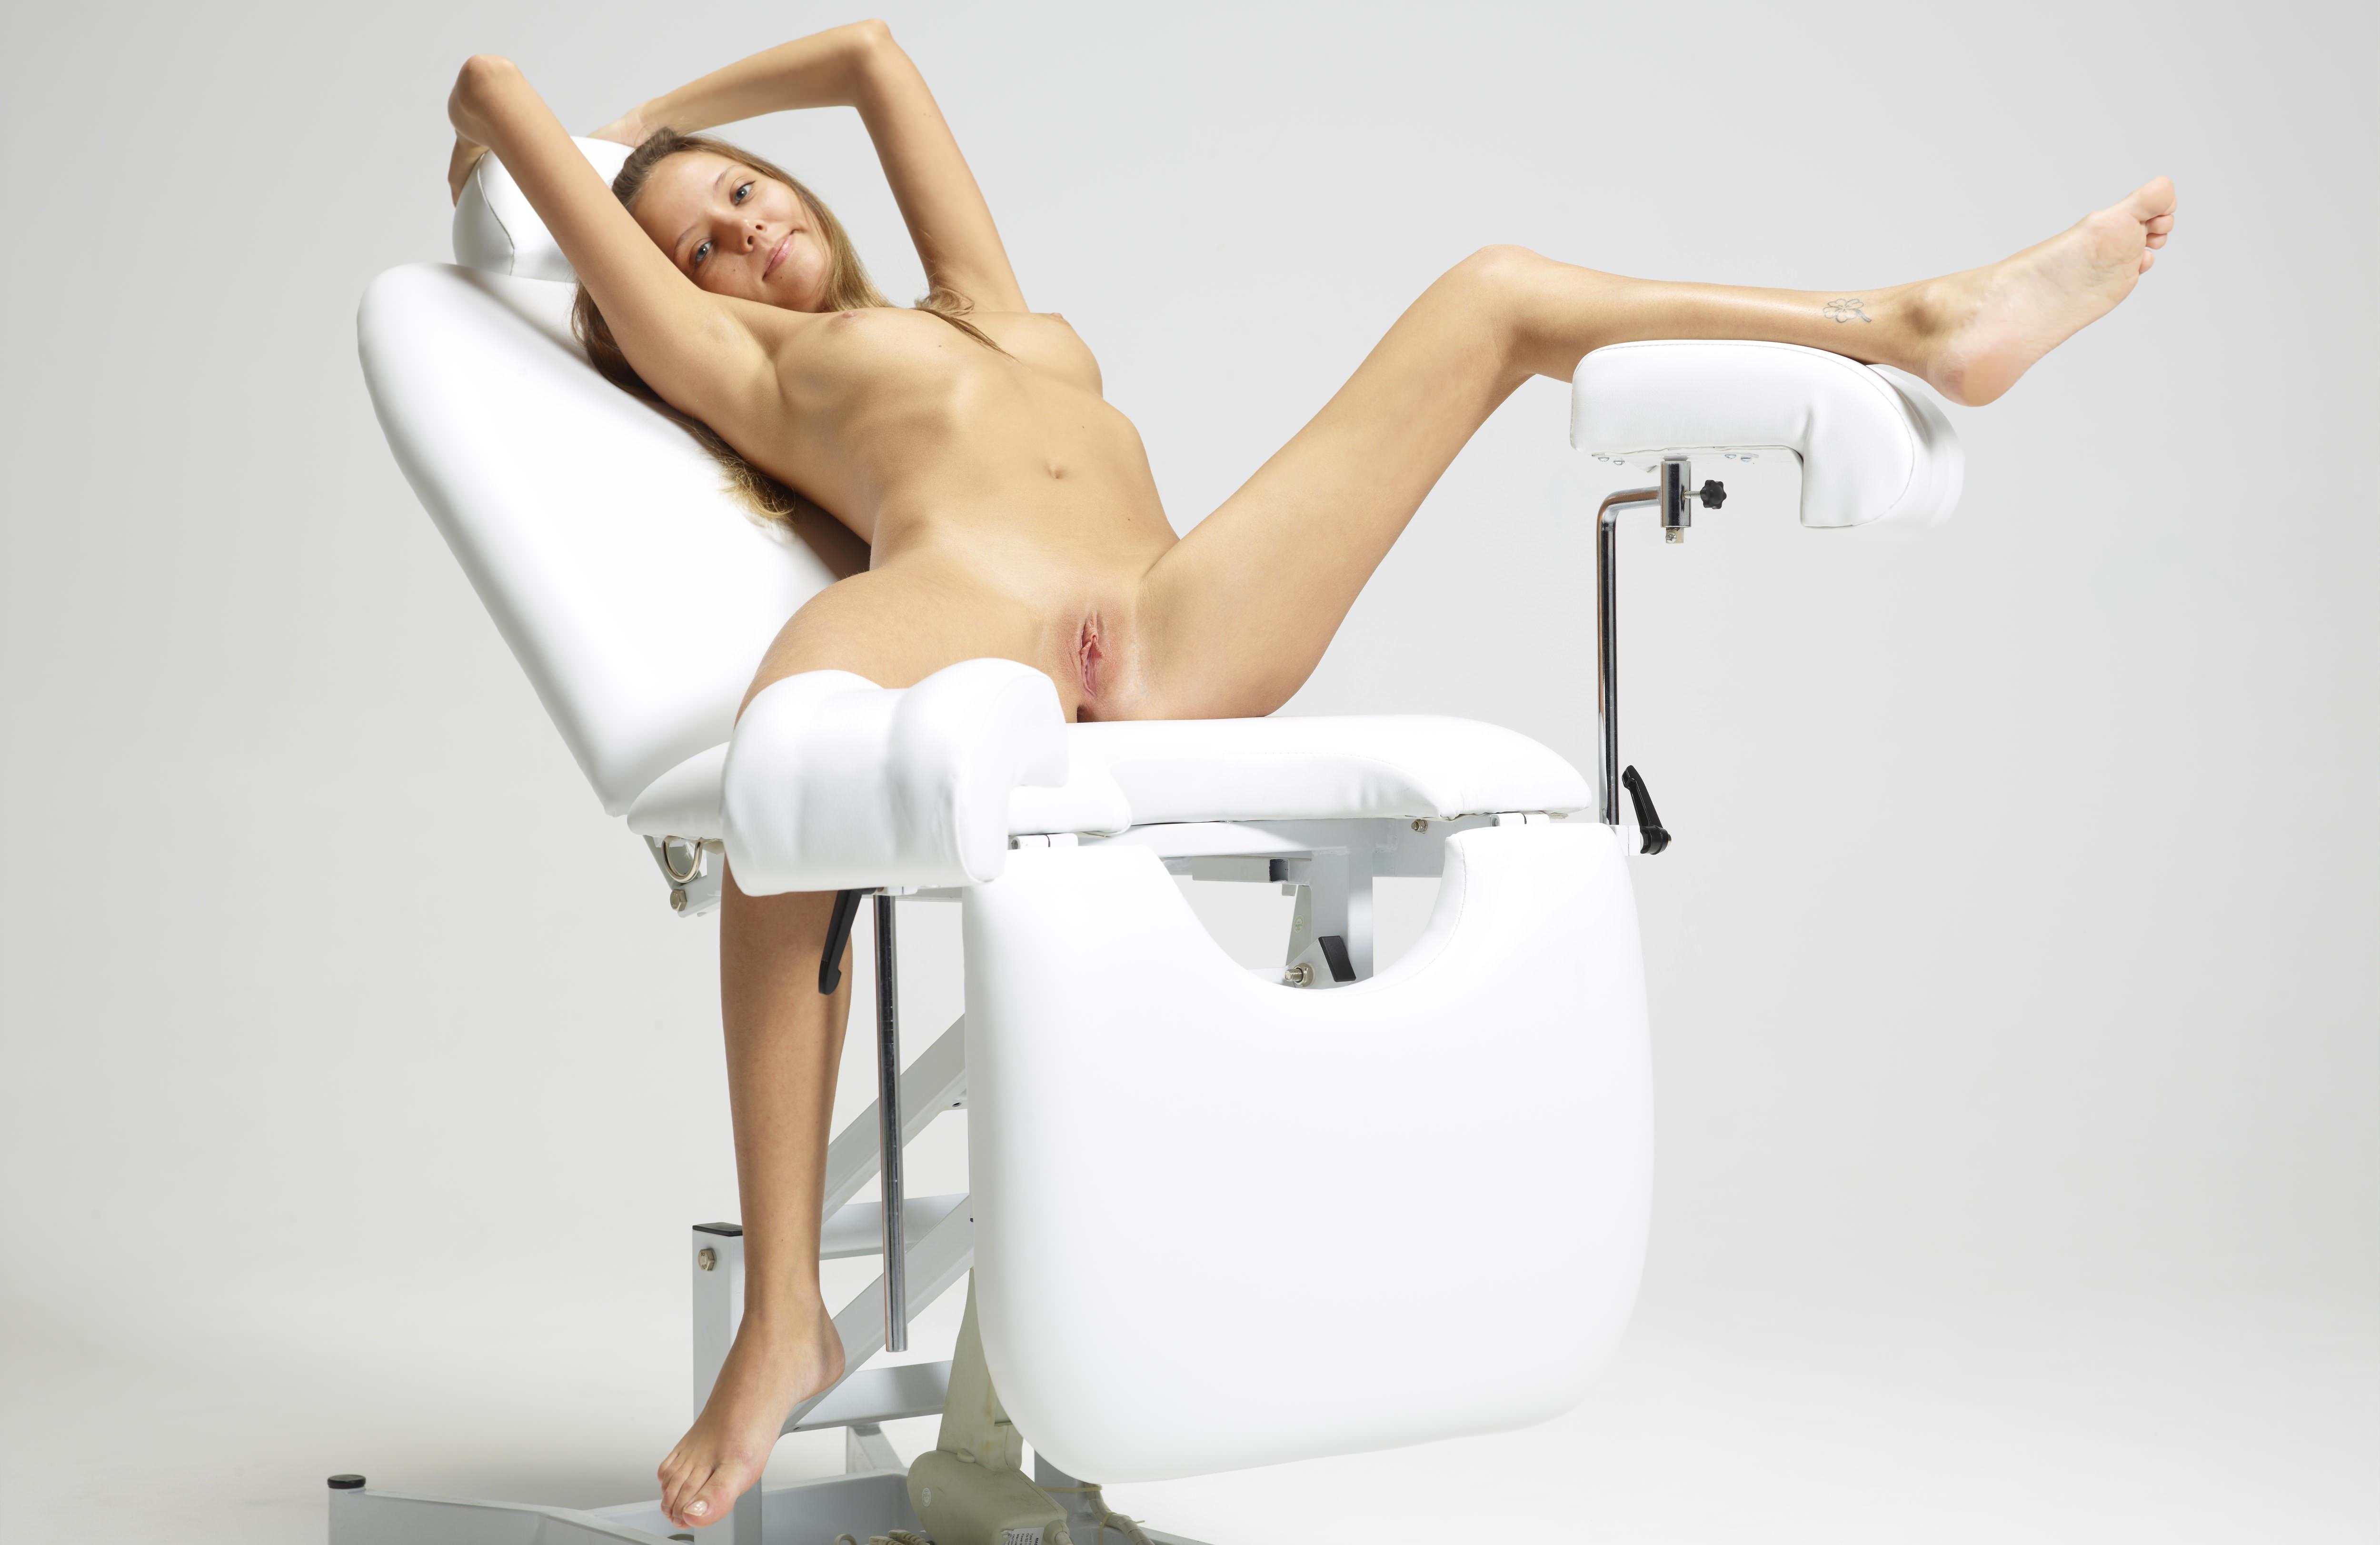 Приеме у гинеколога фото 24 фотография